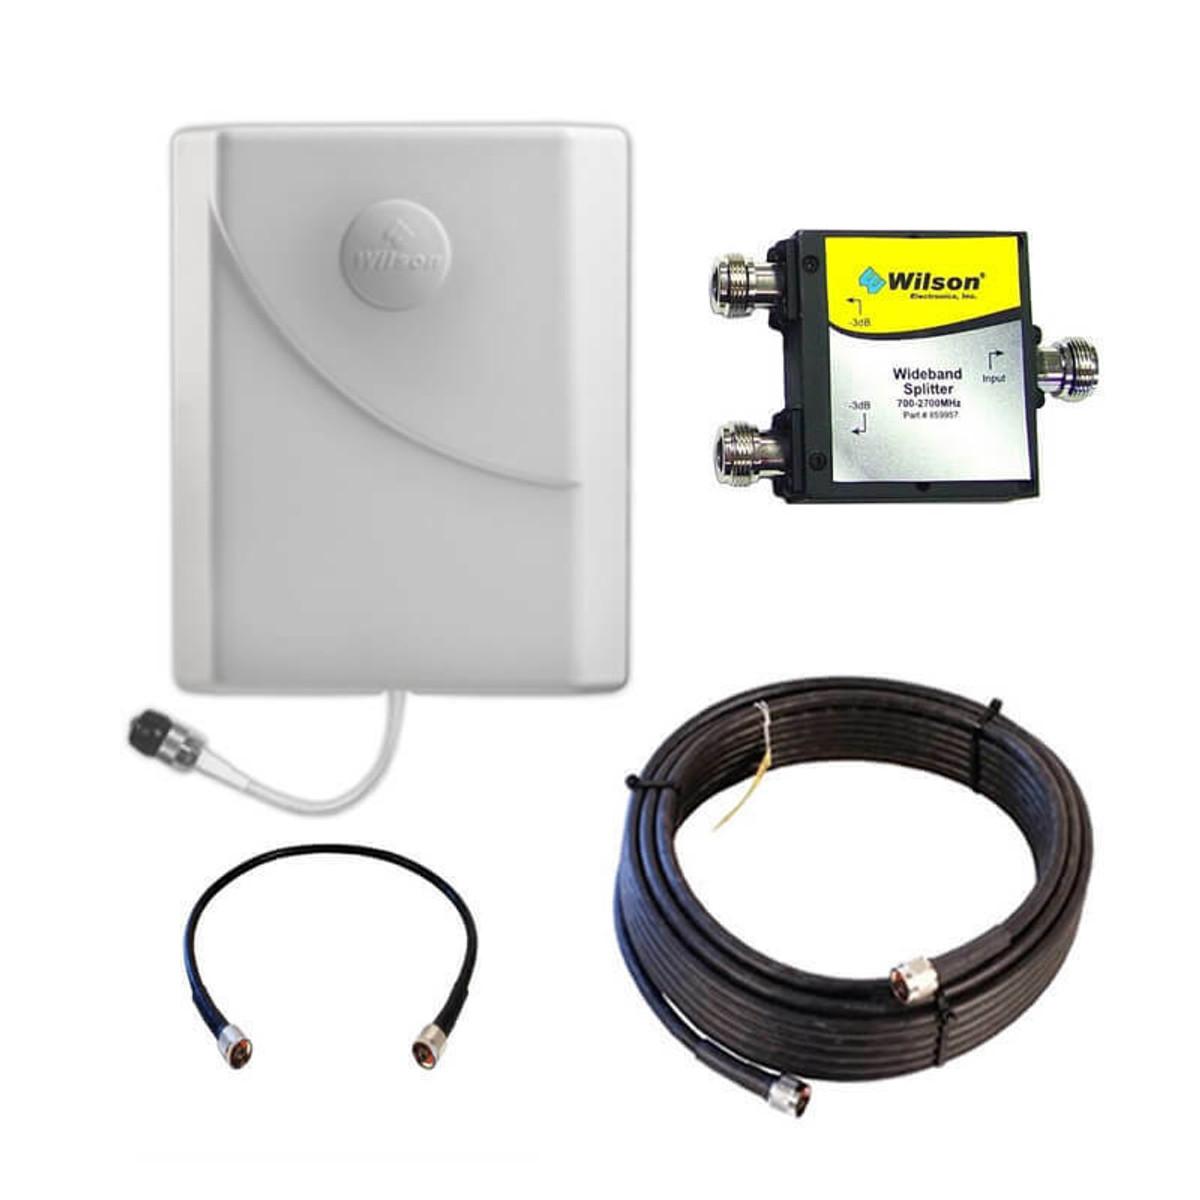 Wilson Electronics Wilson Single Antenna Expansion Kit 50 Ohm - 309906-50N